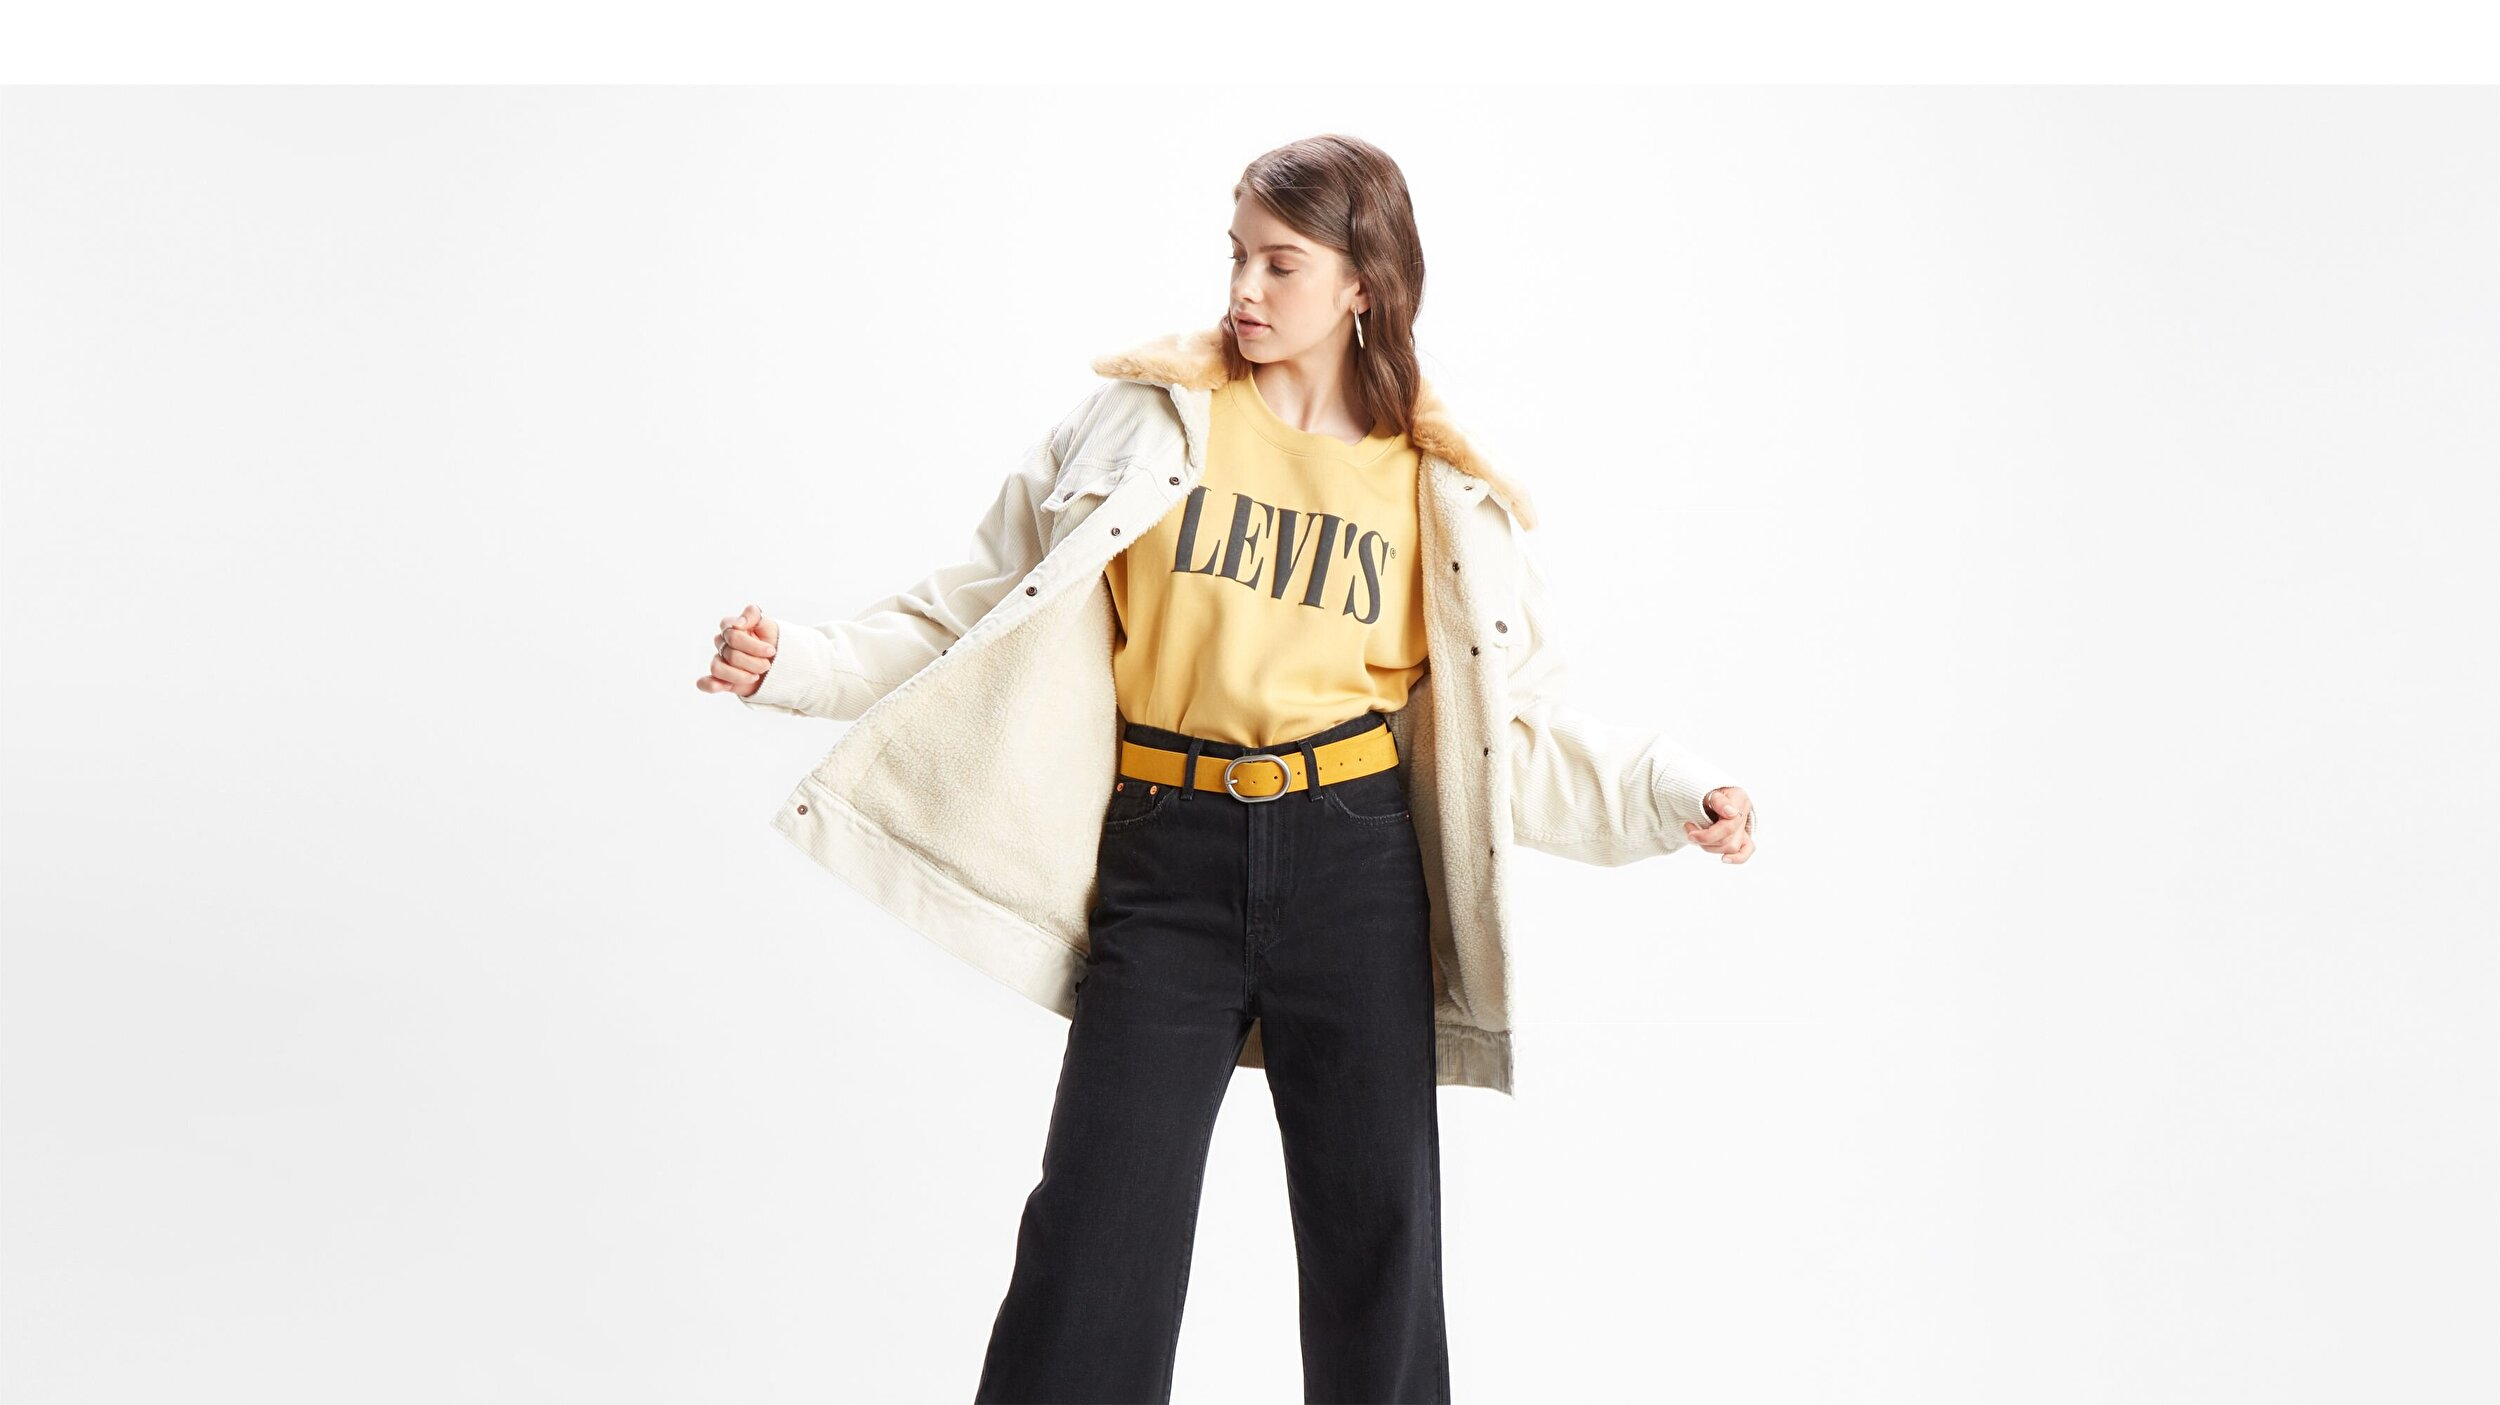 Graphic Diana Crew Crew T2 sarı Kadın Sweatshirt